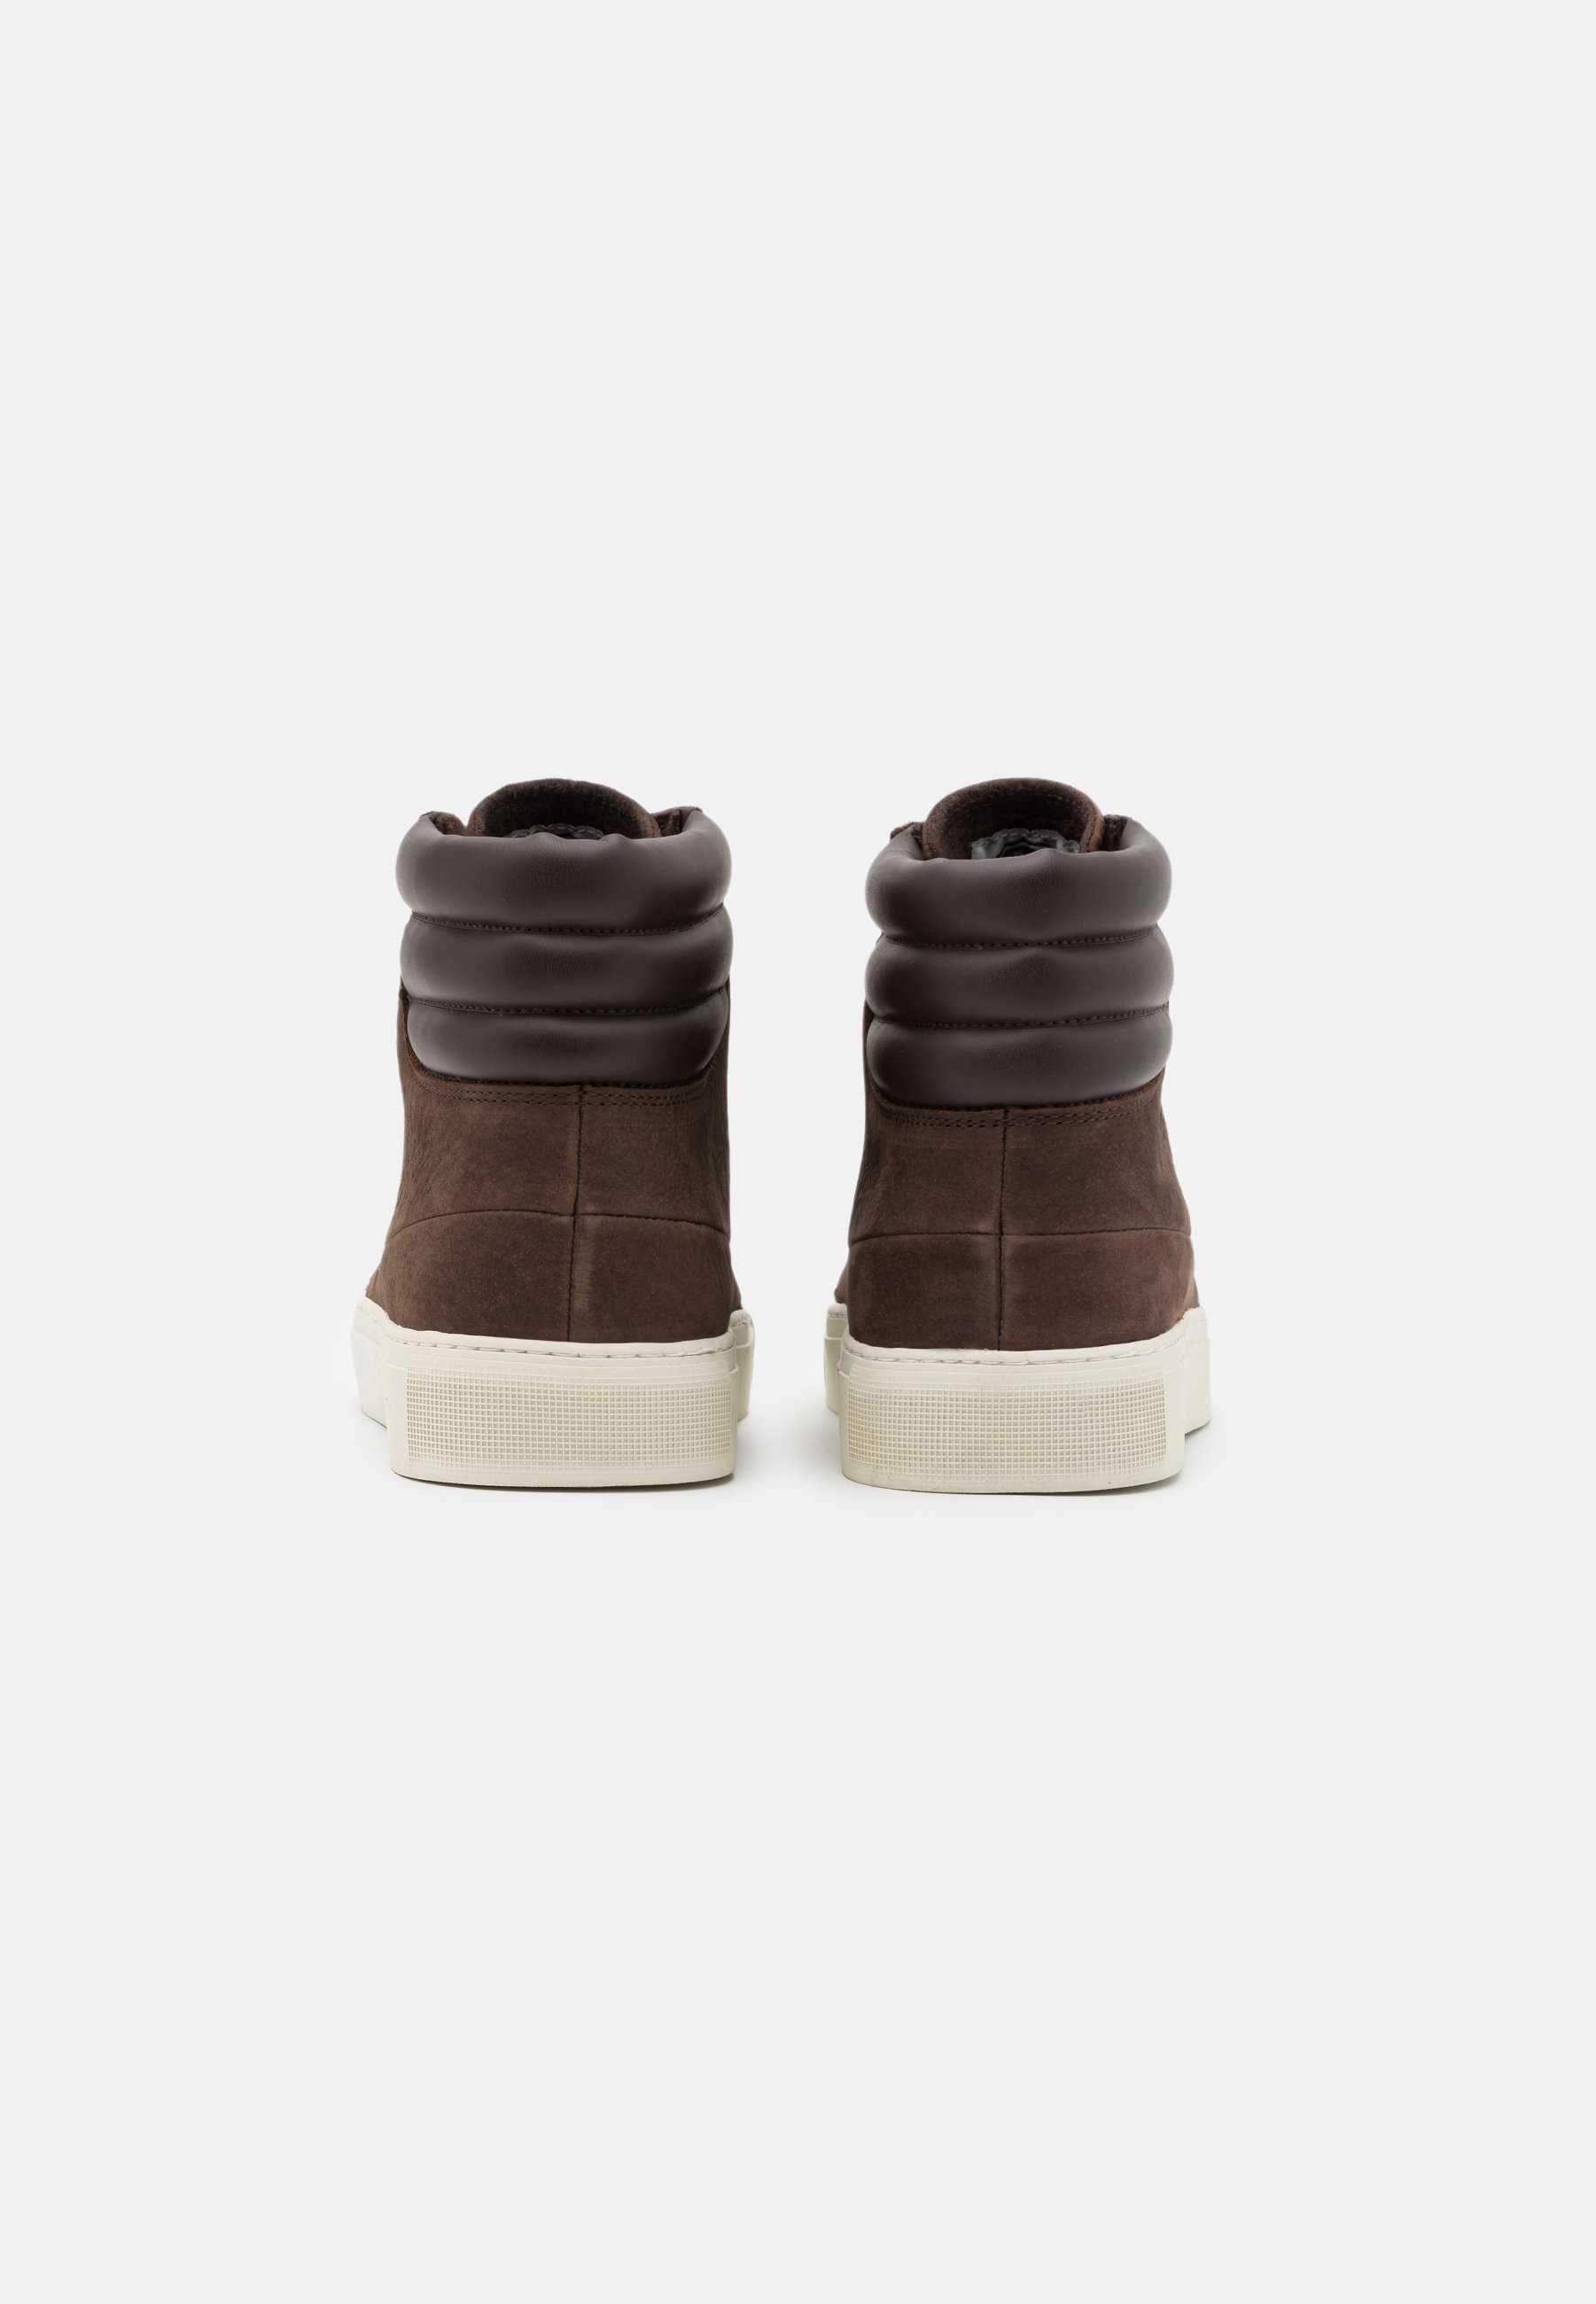 HUB EASTBOURNE - Sneaker high - dark brown/offwhite/braun - Herrenschuhe HzvXo